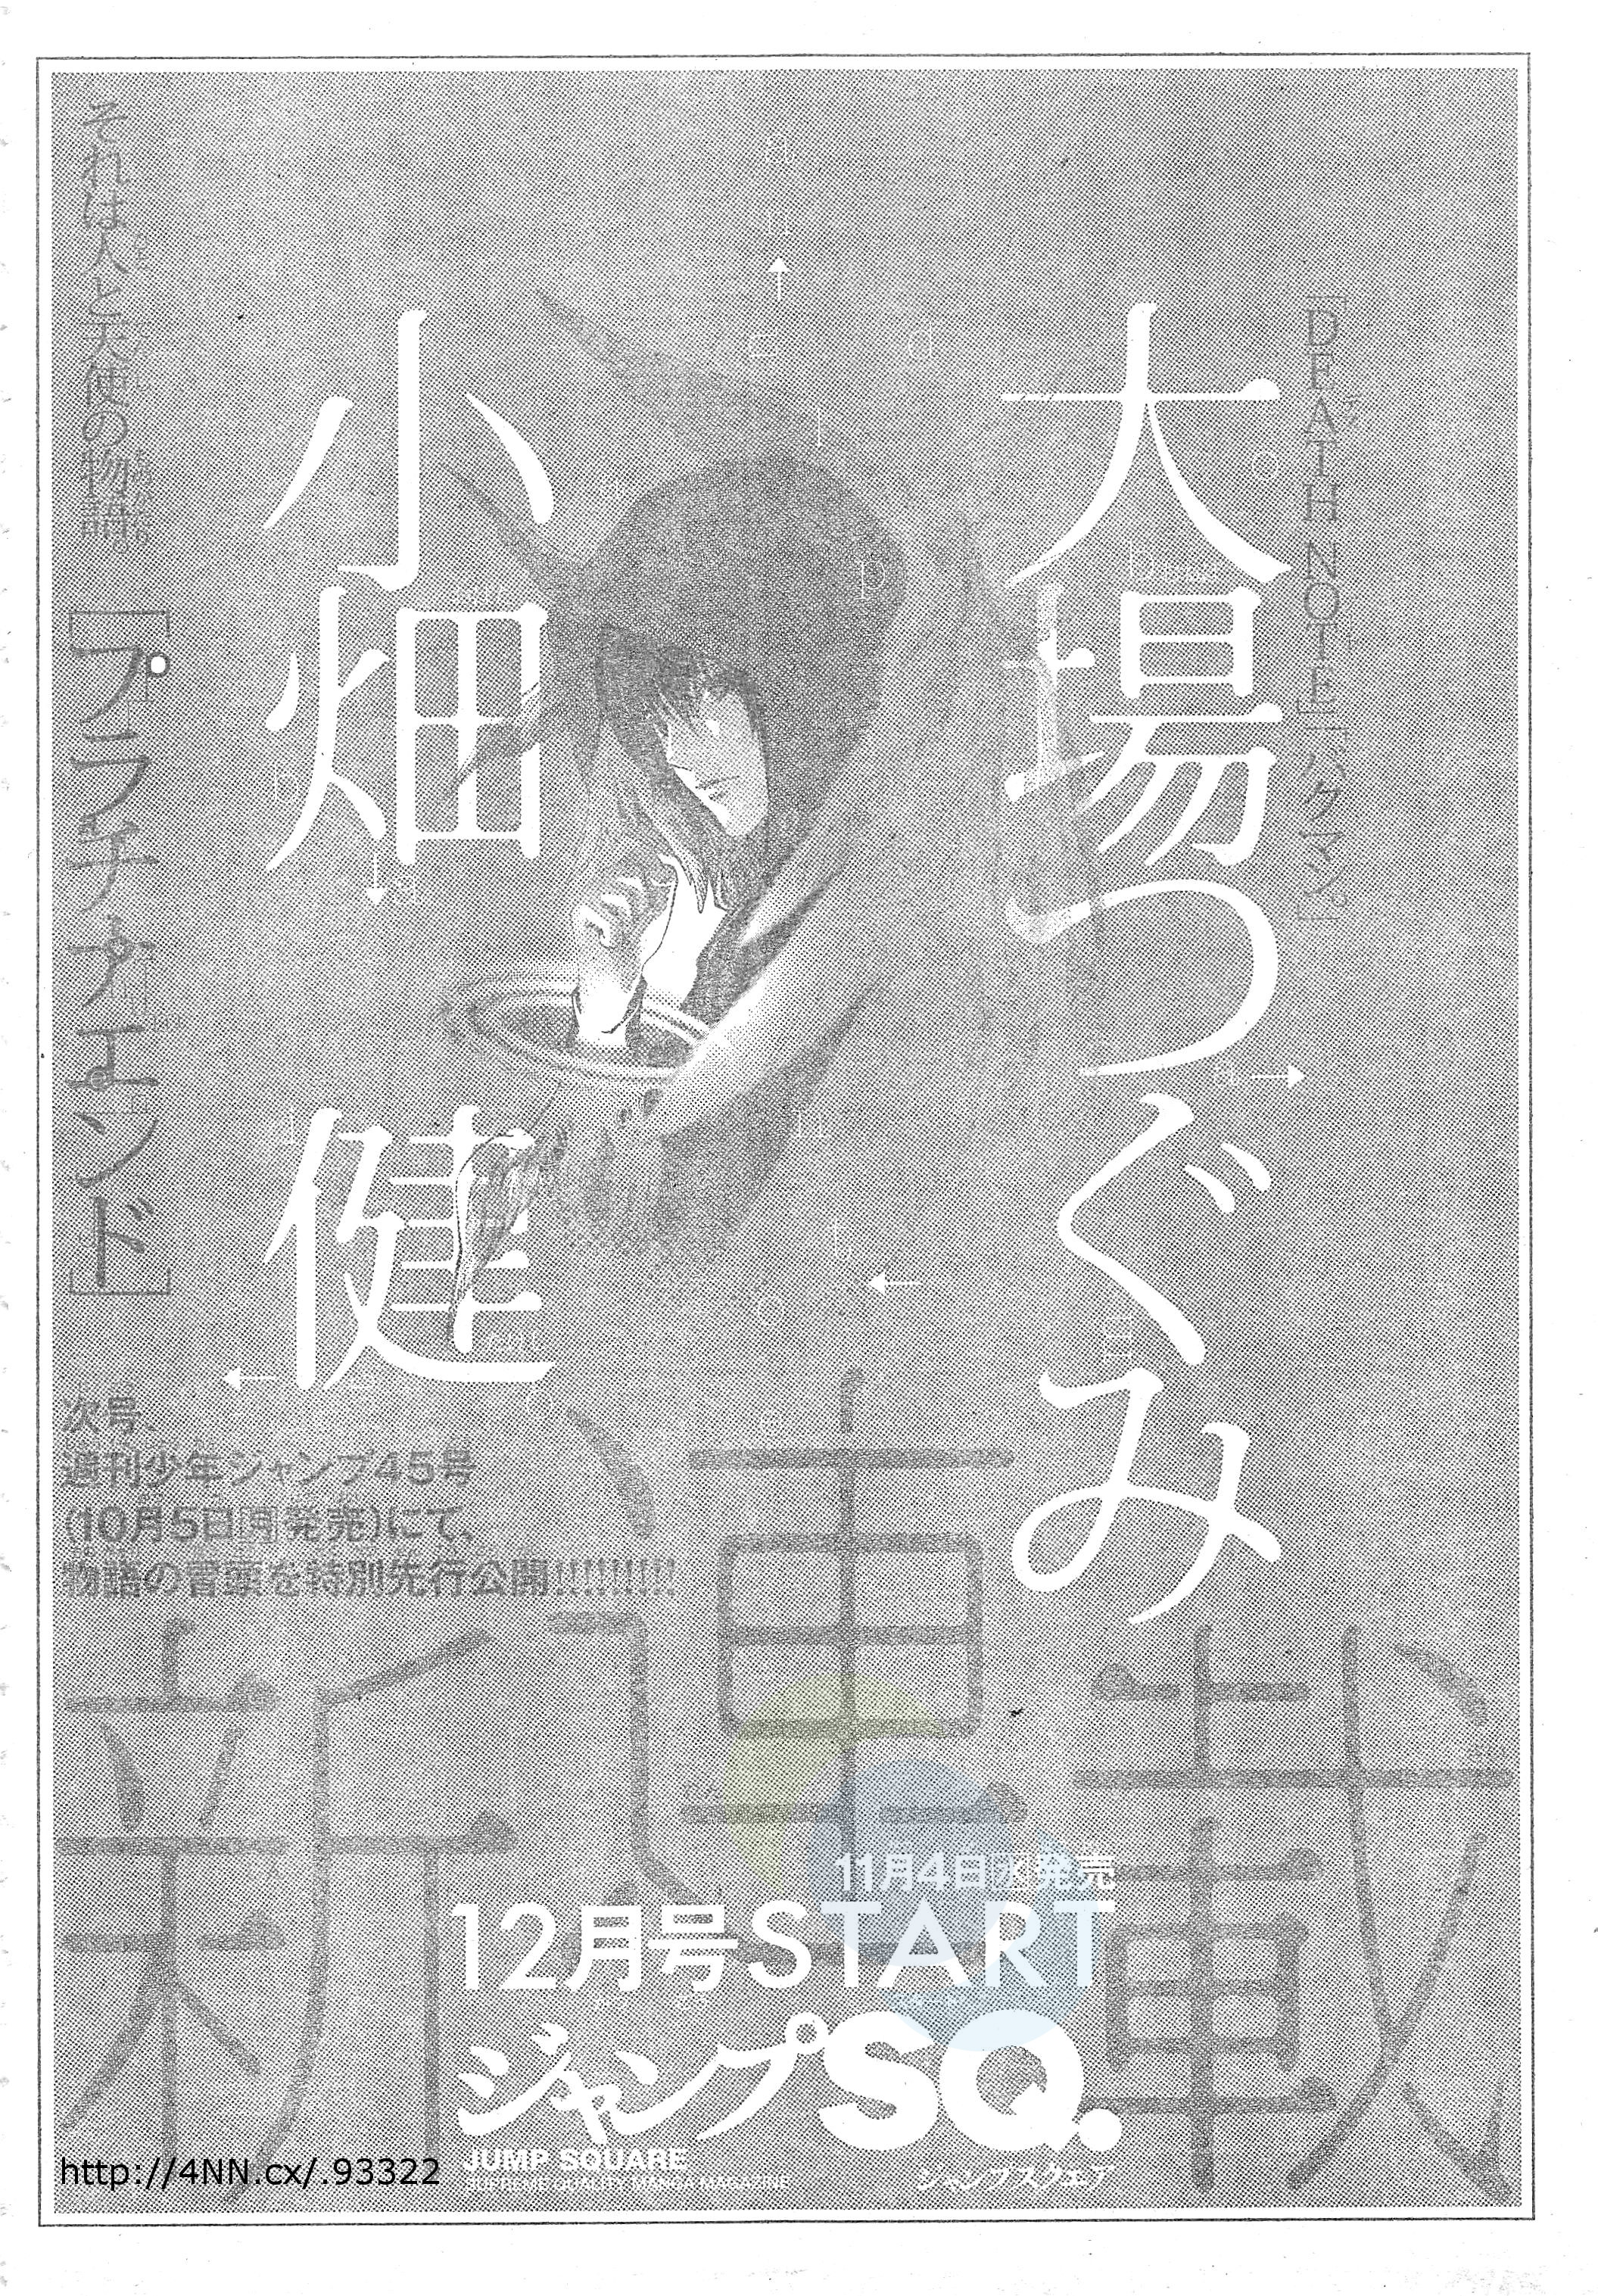 Death Note and Bakuman Creators Start a New Manga Series Titled Platinum End